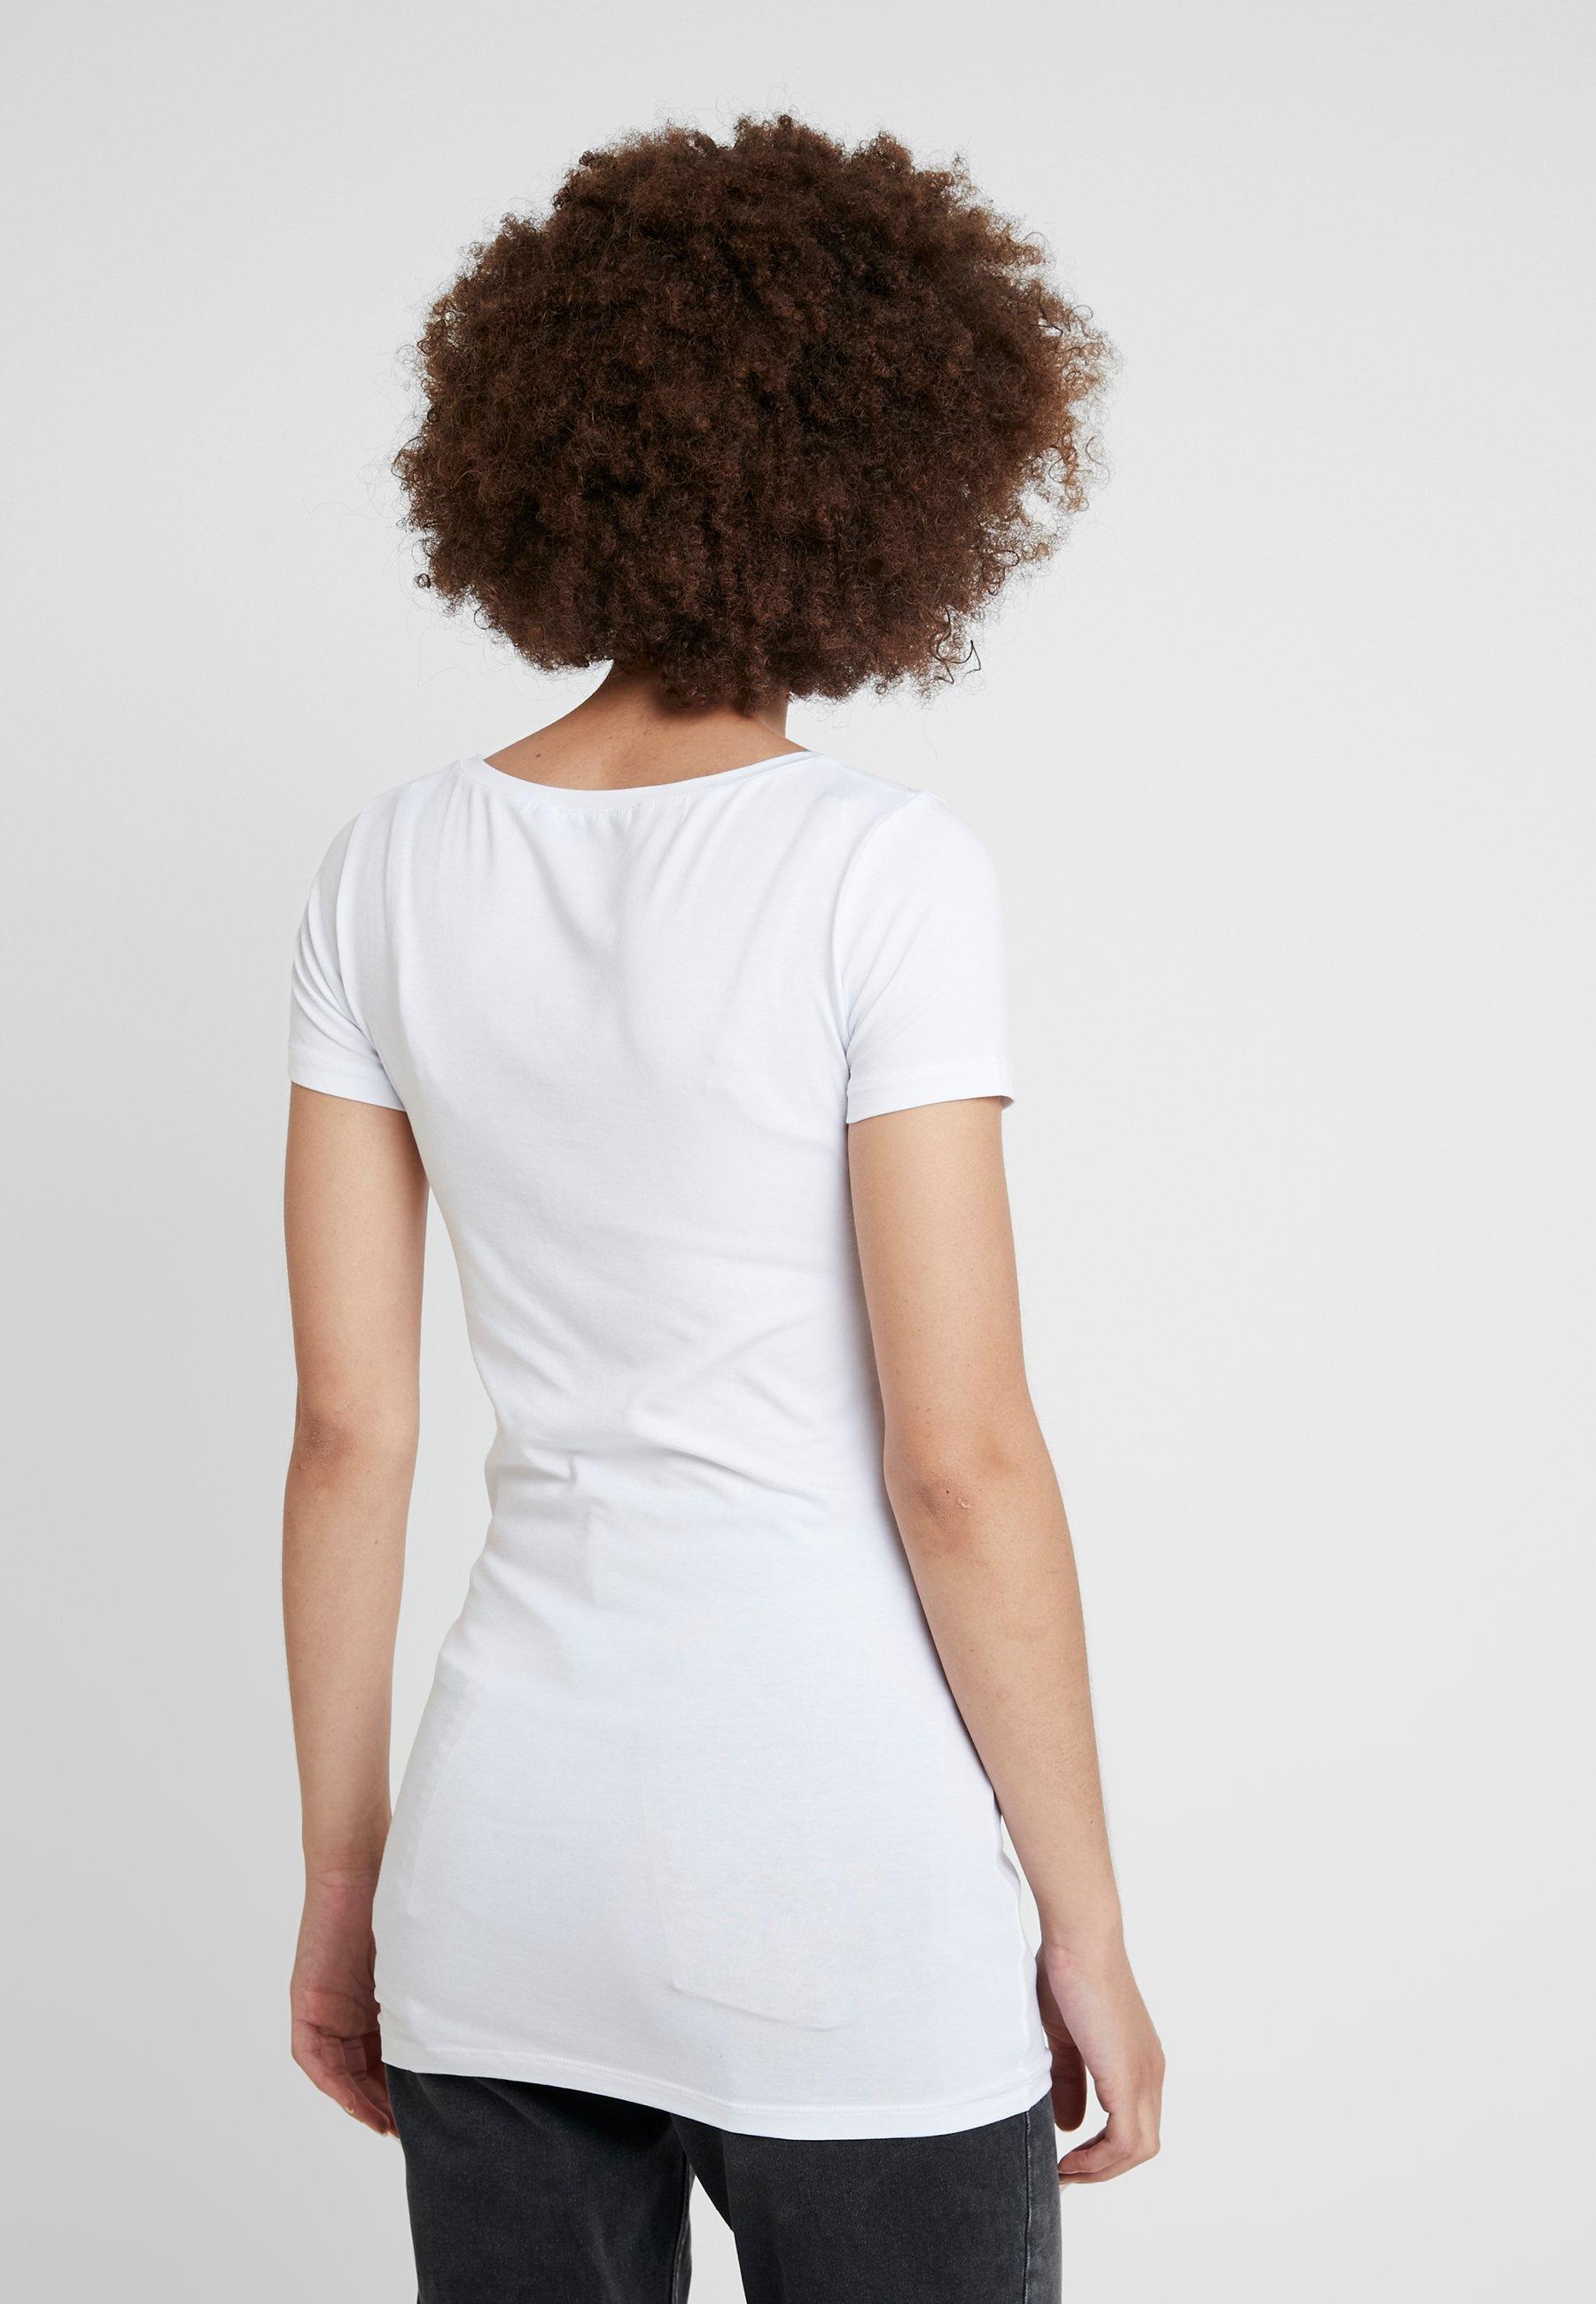 shirt Samsøeamp; shirt Basique White Samsøeamp; SadieT Basique SadieT White Samsøeamp; SadieT pUSzMV